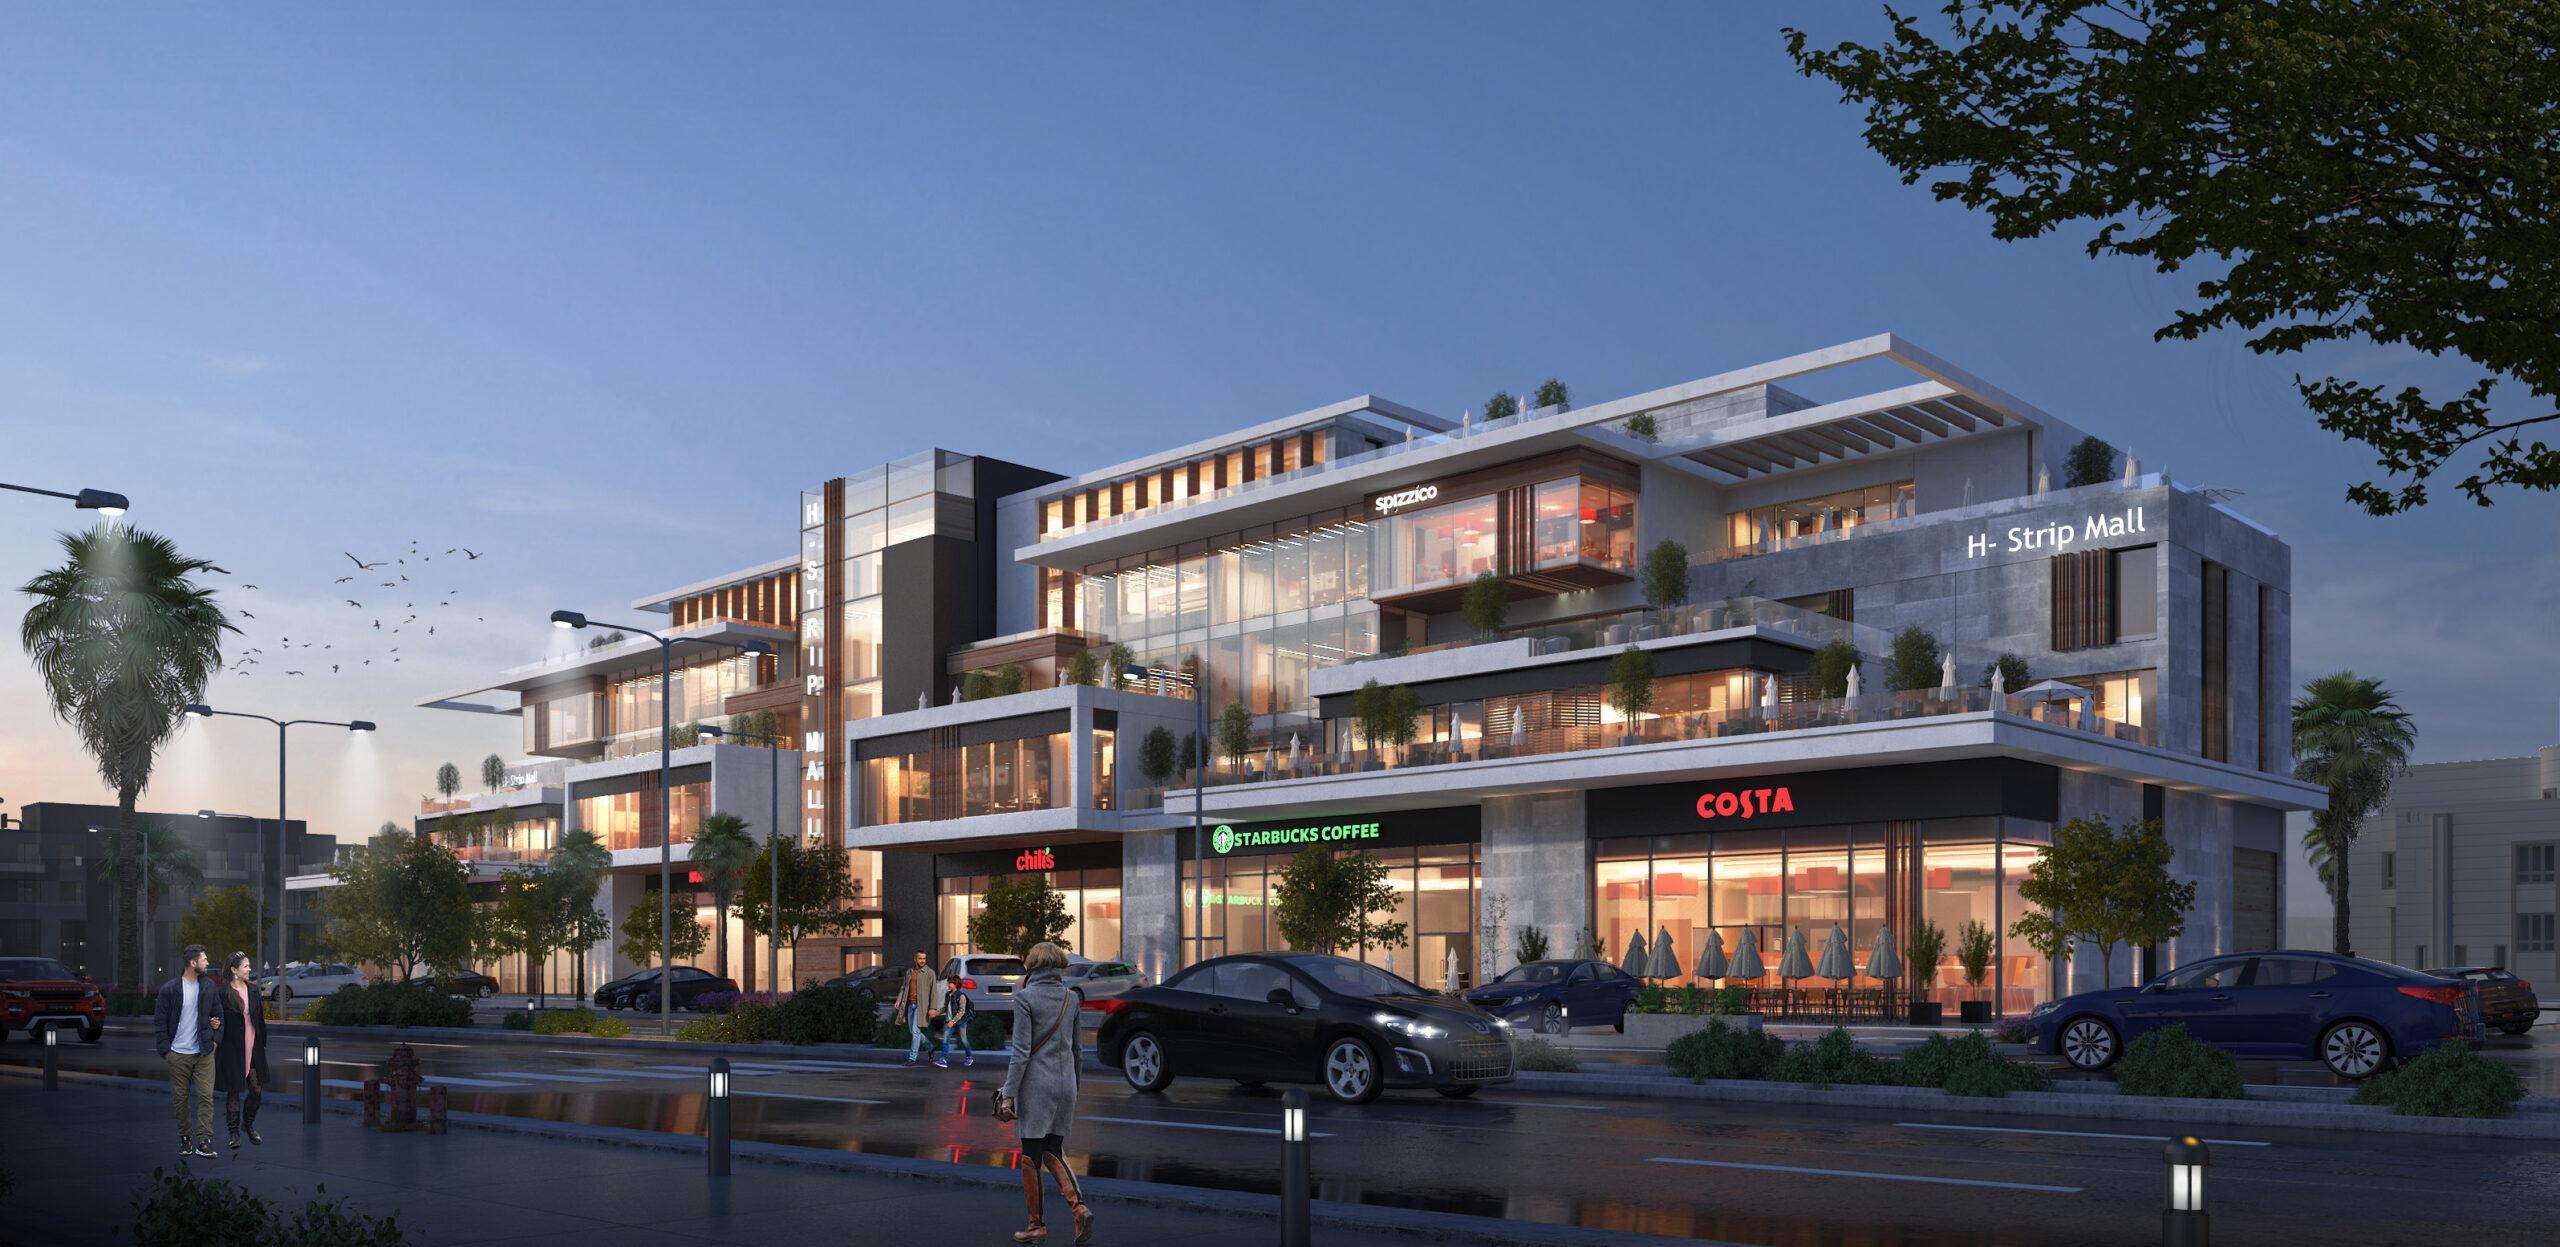 jiddah strip mall 2